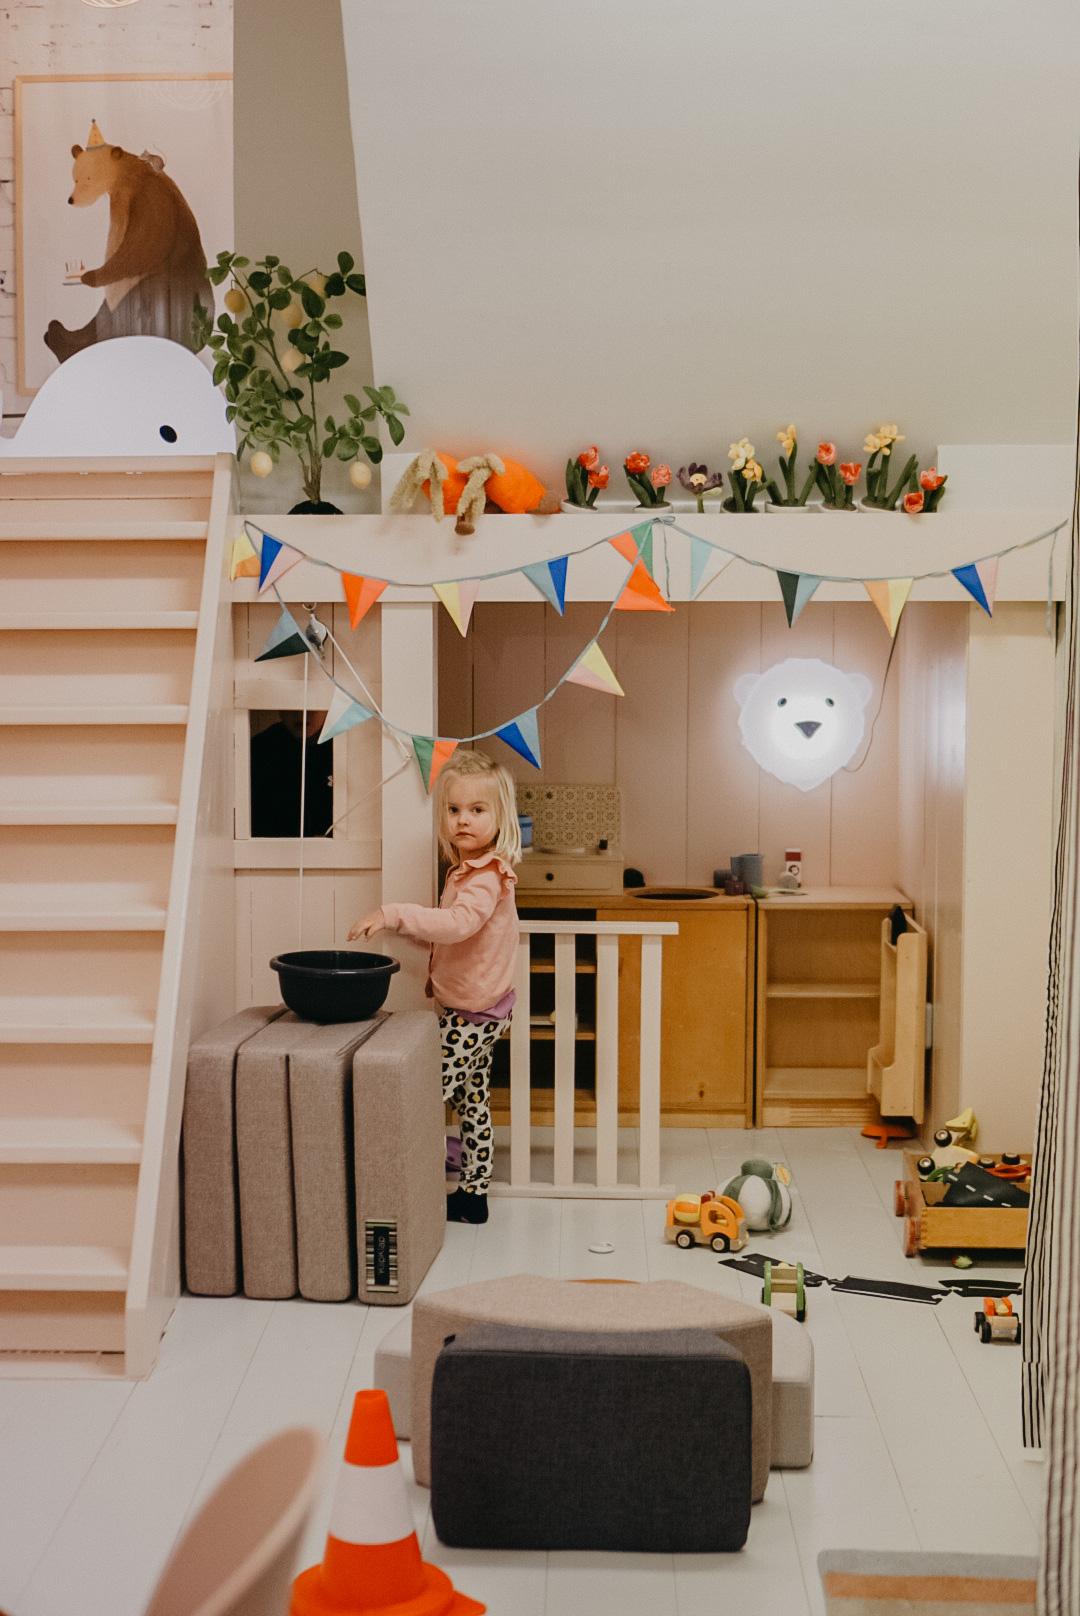 kinderkledingwinkel vierseizoenen Leeuwarden speelhoek